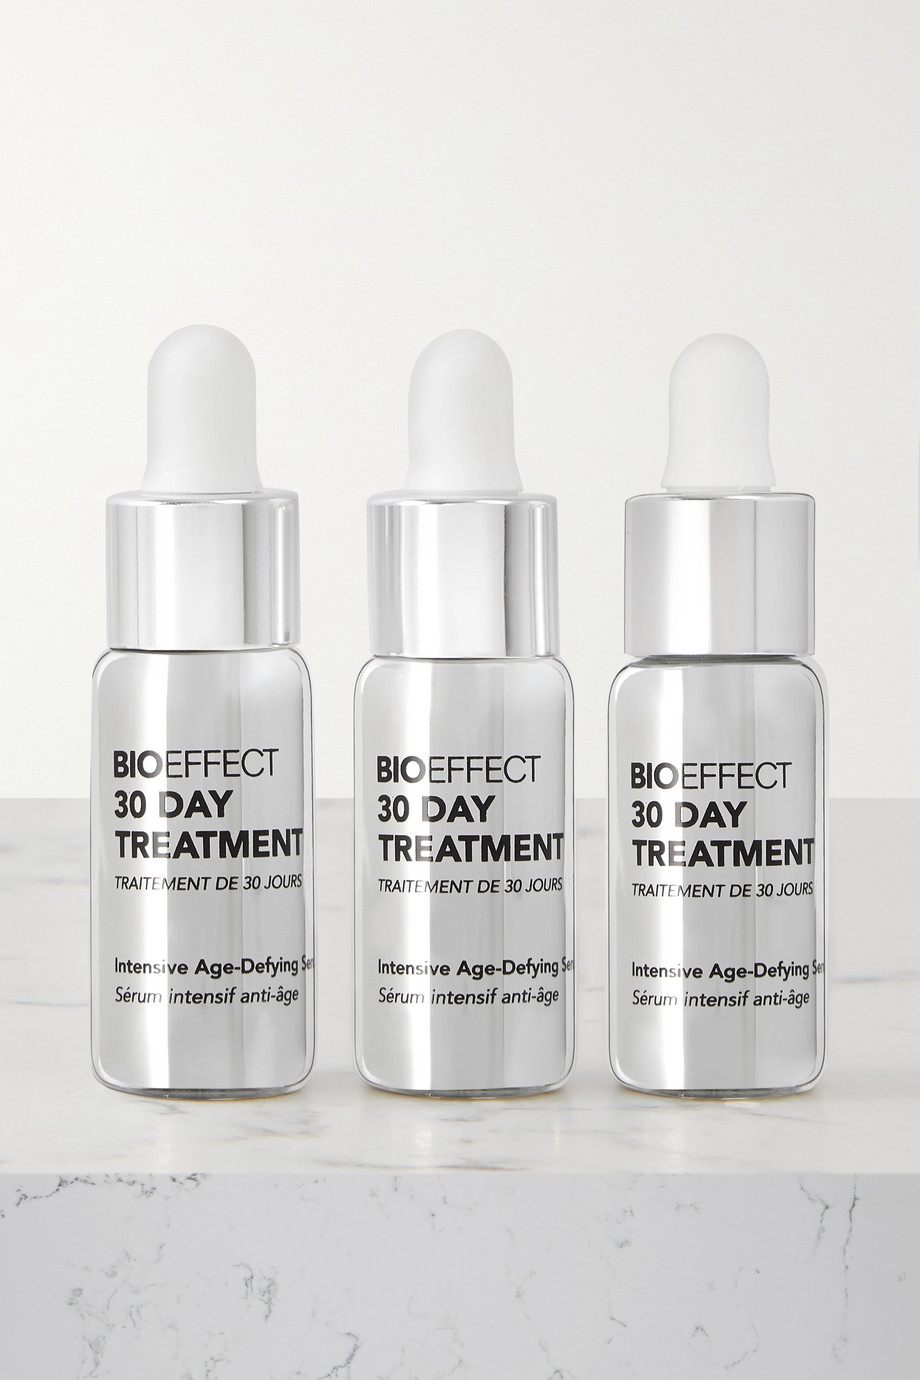 BIOEFFECT 30 Day Treatment, 15ml